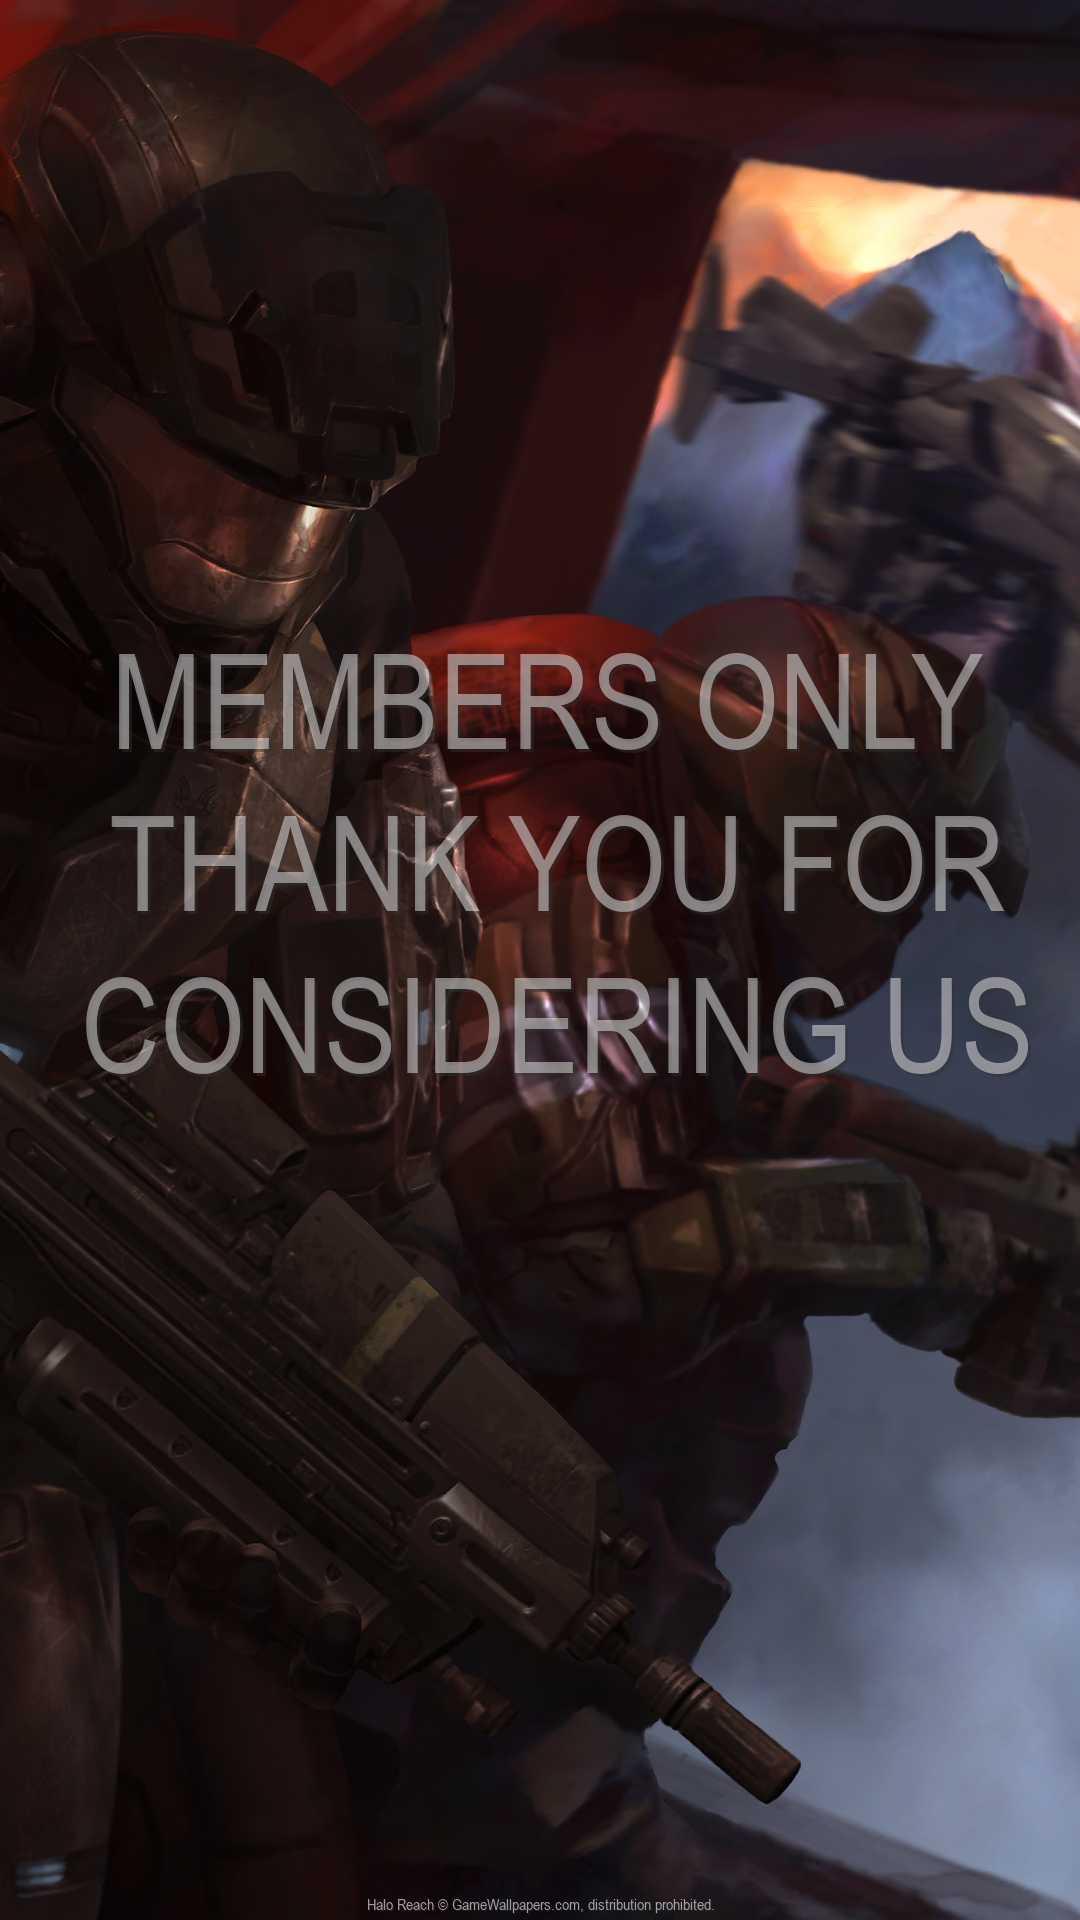 Halo: Reach 1080p Vertical Móvil fondo de escritorio 09